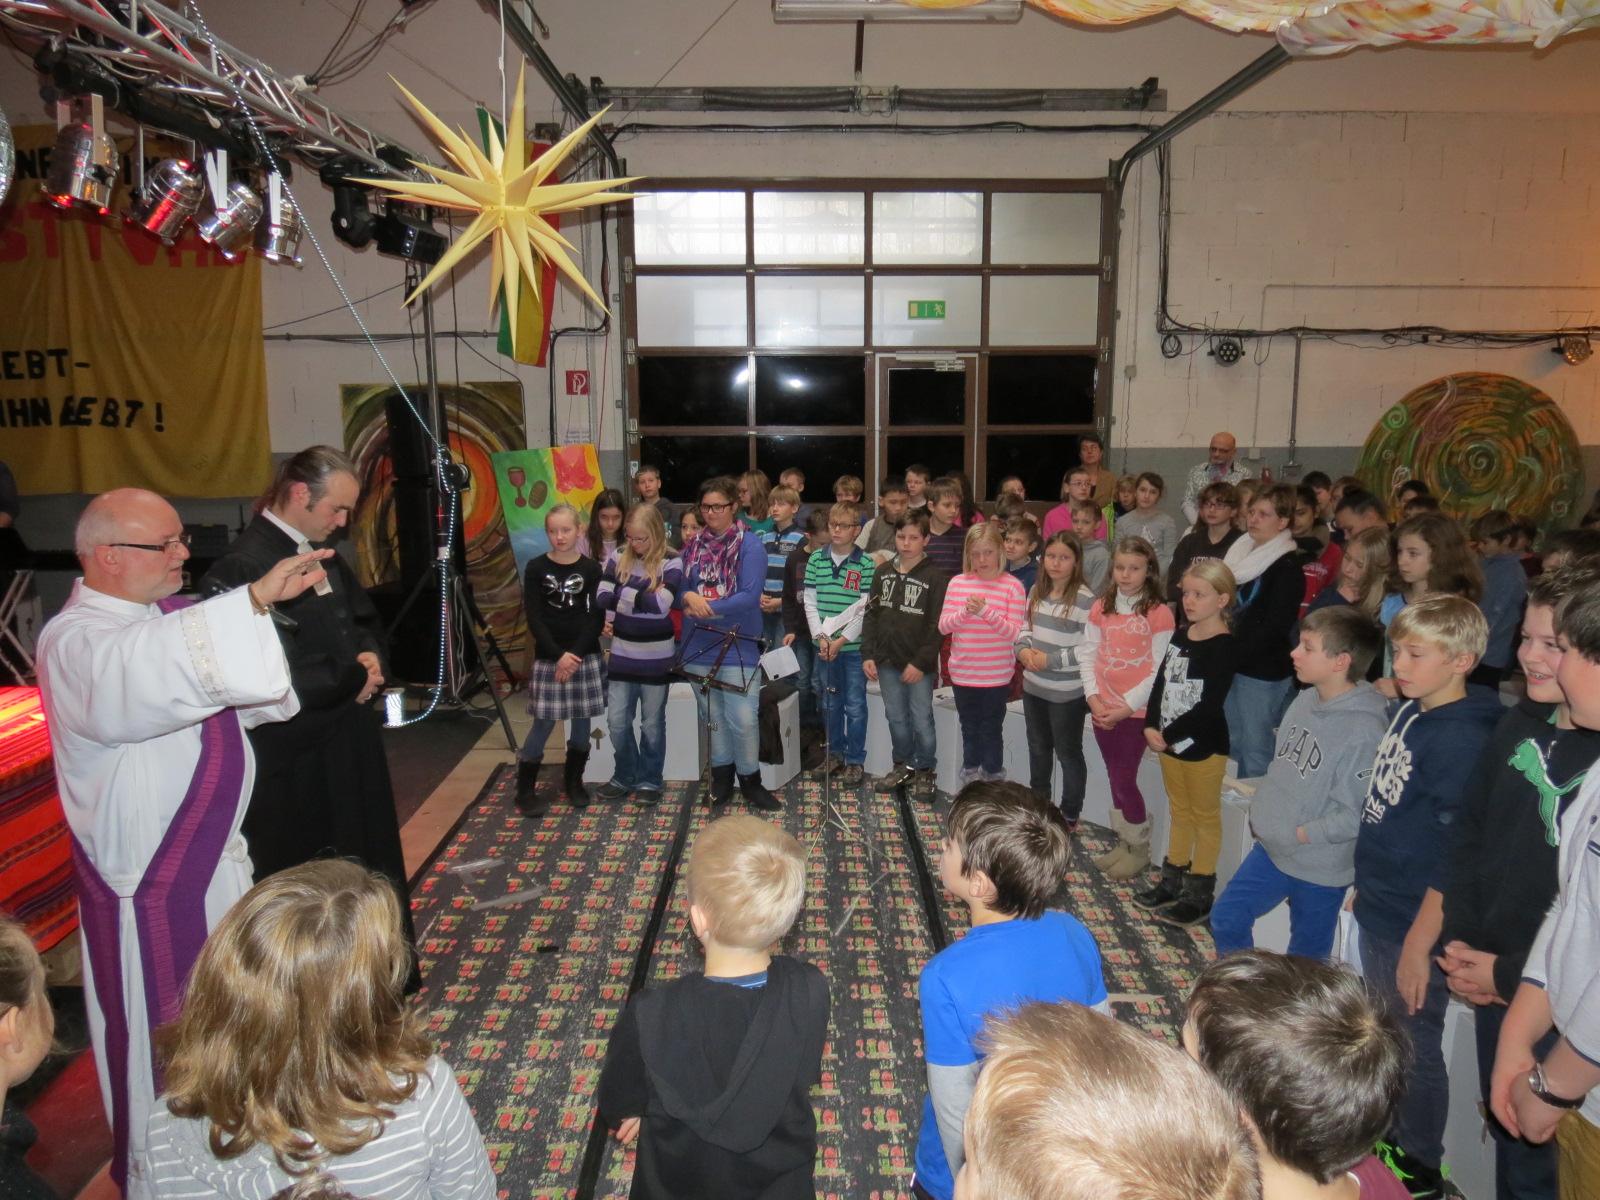 Paul-Schneider-Schüler feiern mit Grundschülern Weihnachten | Paul ...